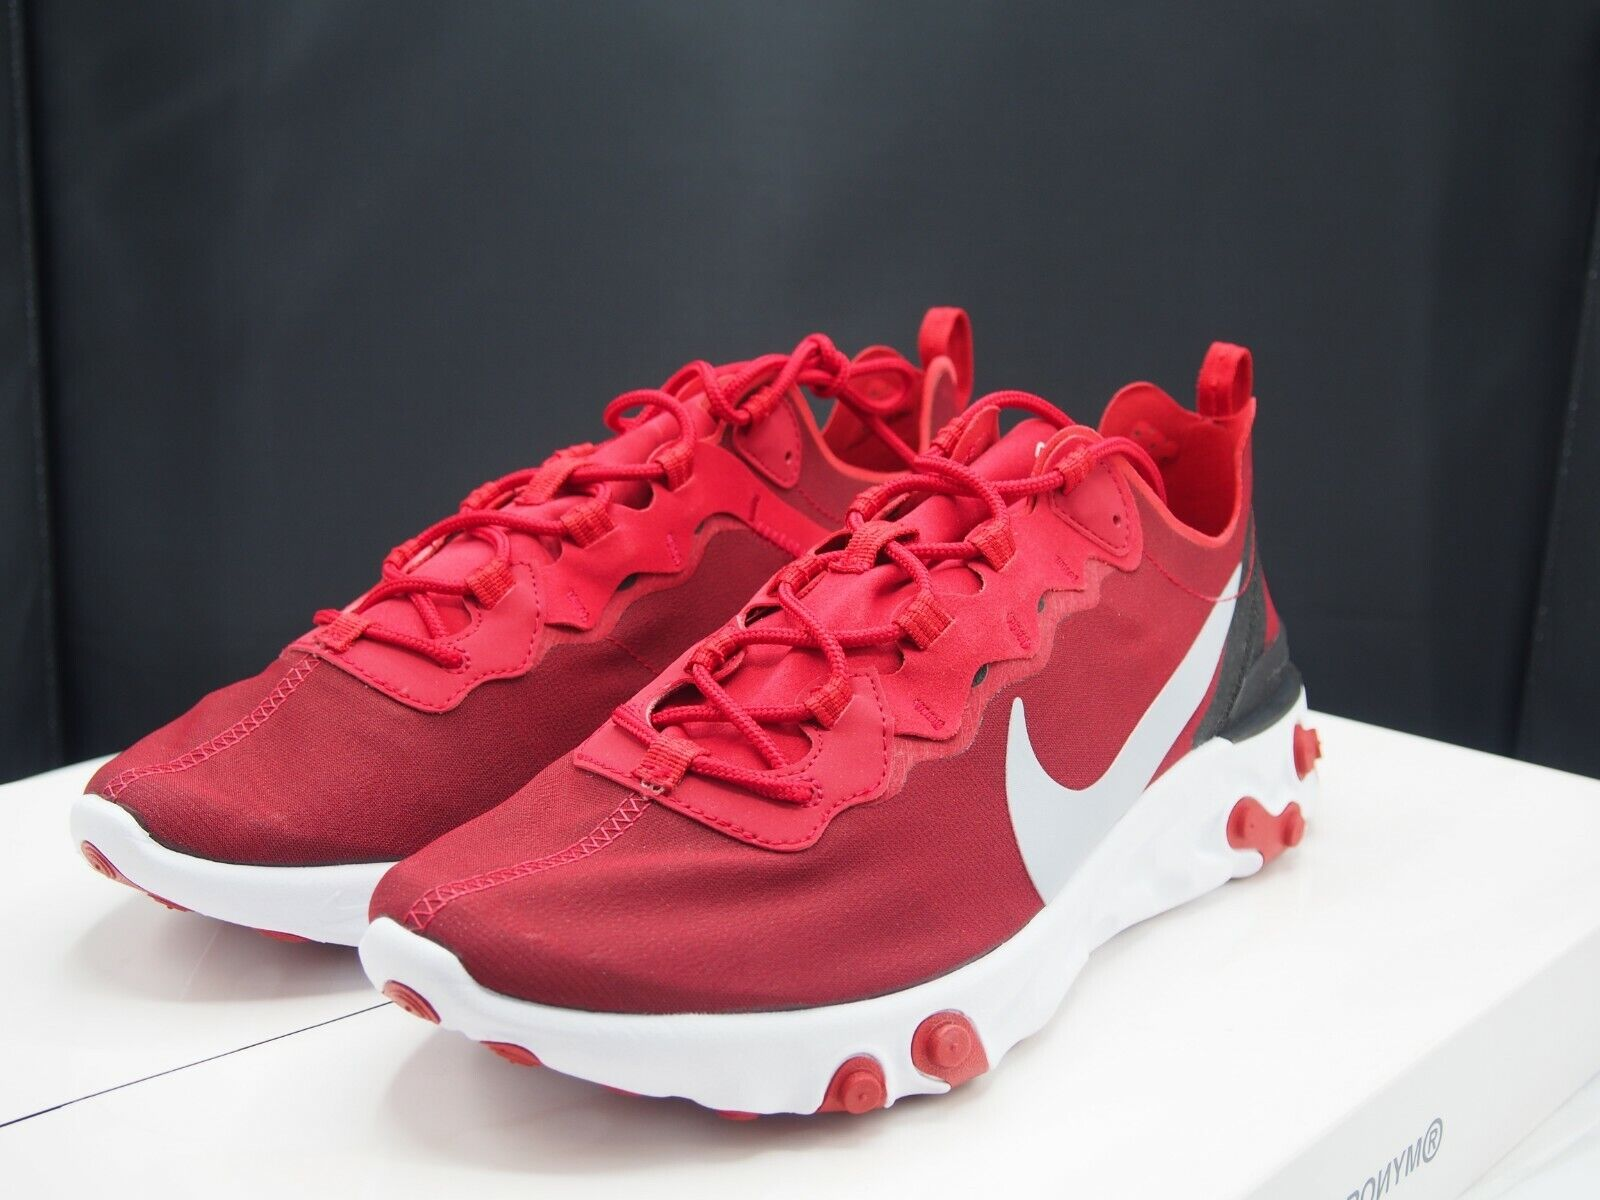 Nike React Element 55 Gym Red BQ6166-601 Men's size 11 11 11 US 564d08